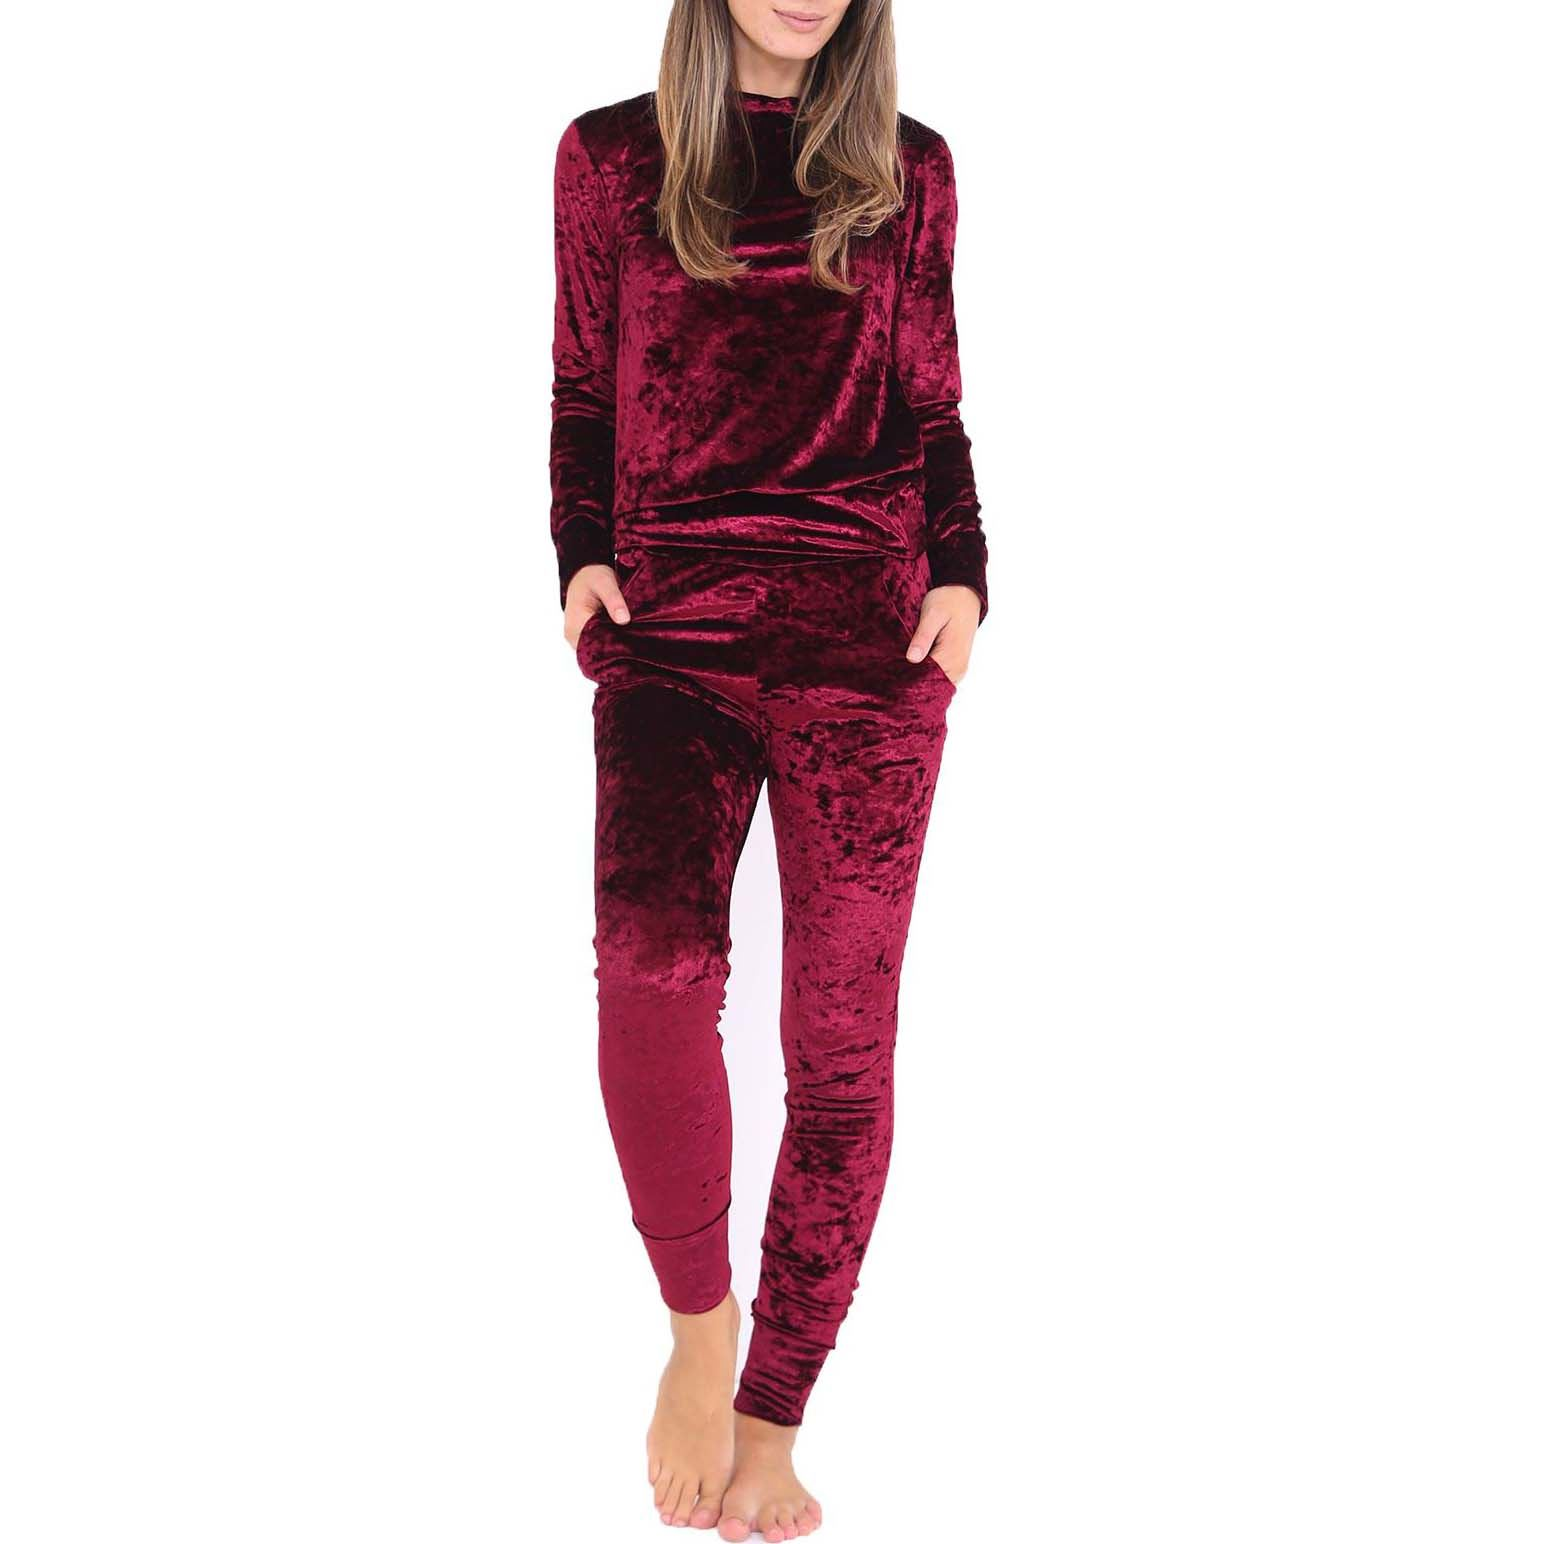 Ladies Kids Crushed Velvet Lounge Suit Sweatshirt Womens Lounge ...